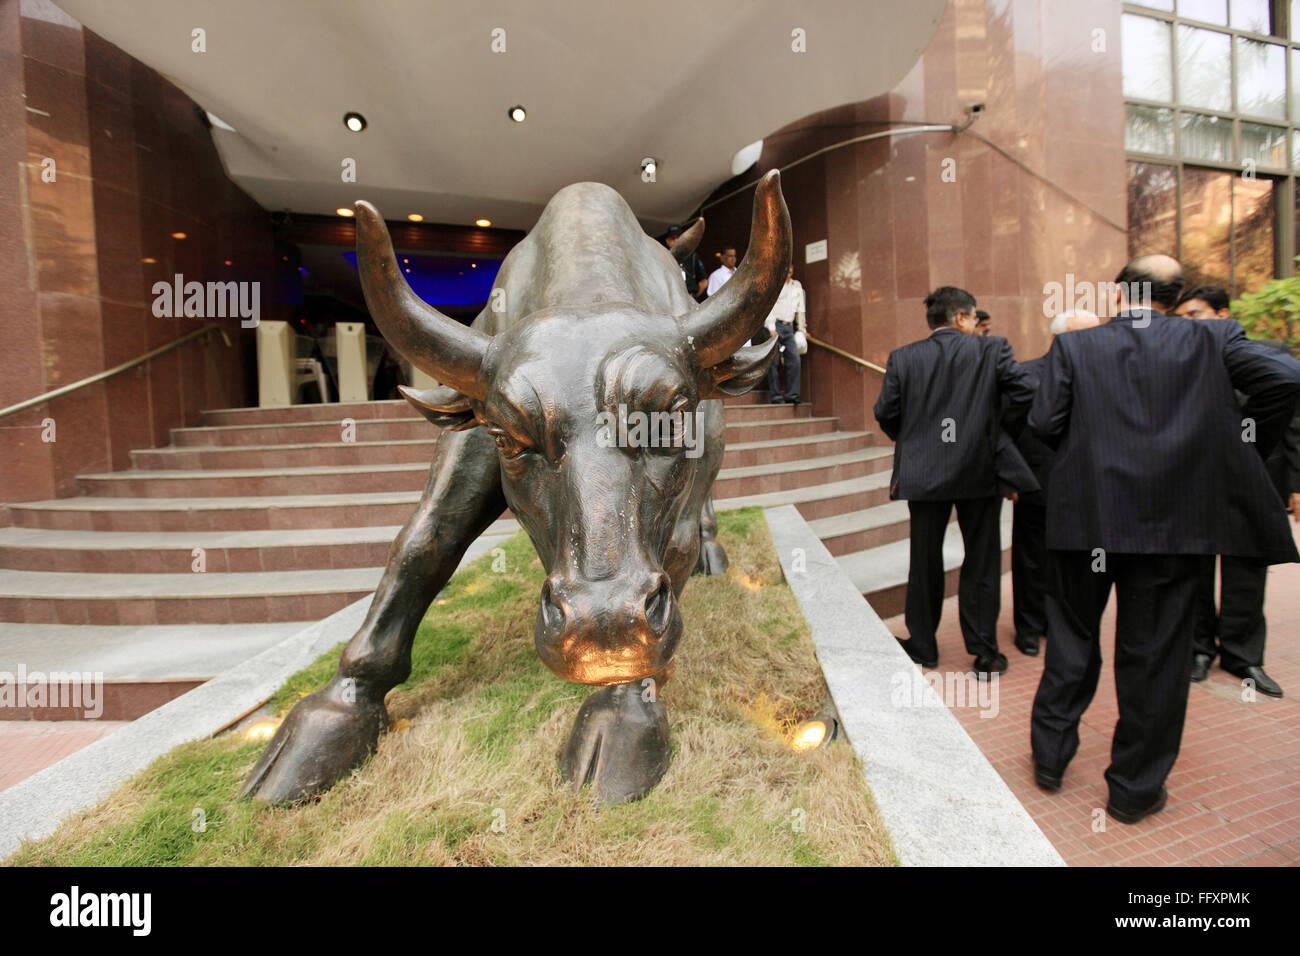 Man bull sculpture stock photos man bull sculpture stock images bronze bull statue at bombay stock exchange bse bombay mumbai maharashtra india buycottarizona